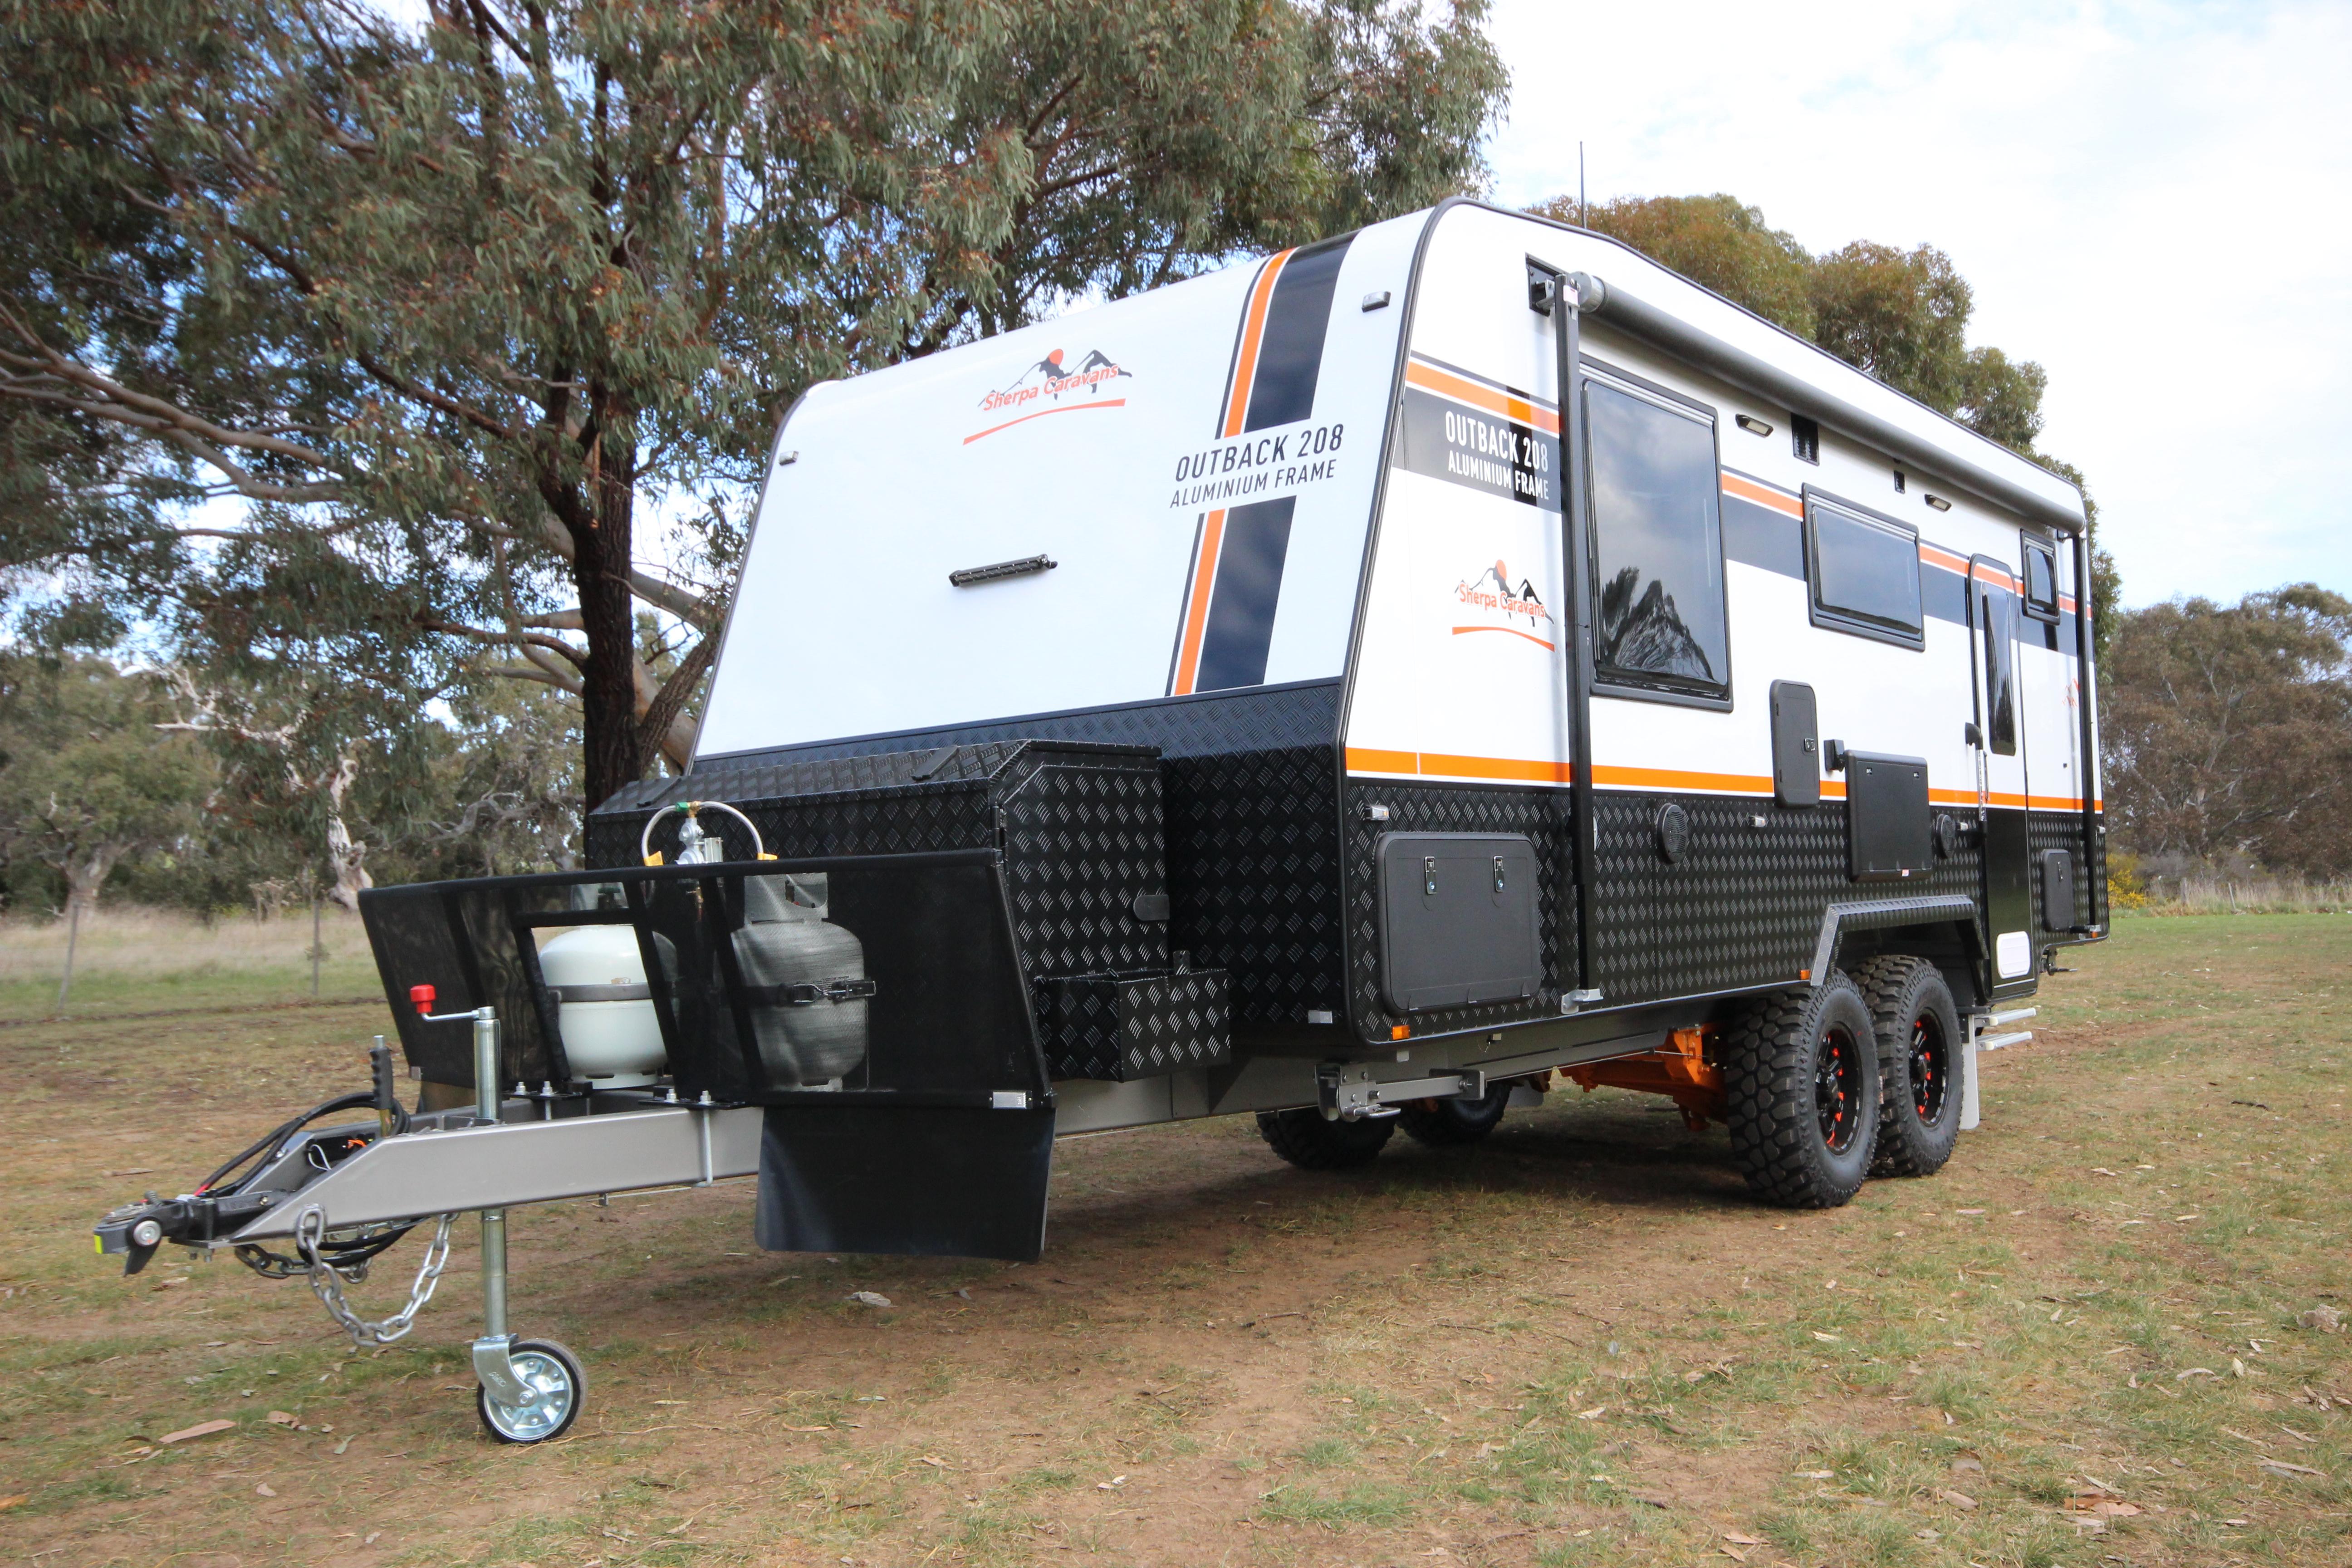 eden-caravans-outback-208-2jpg